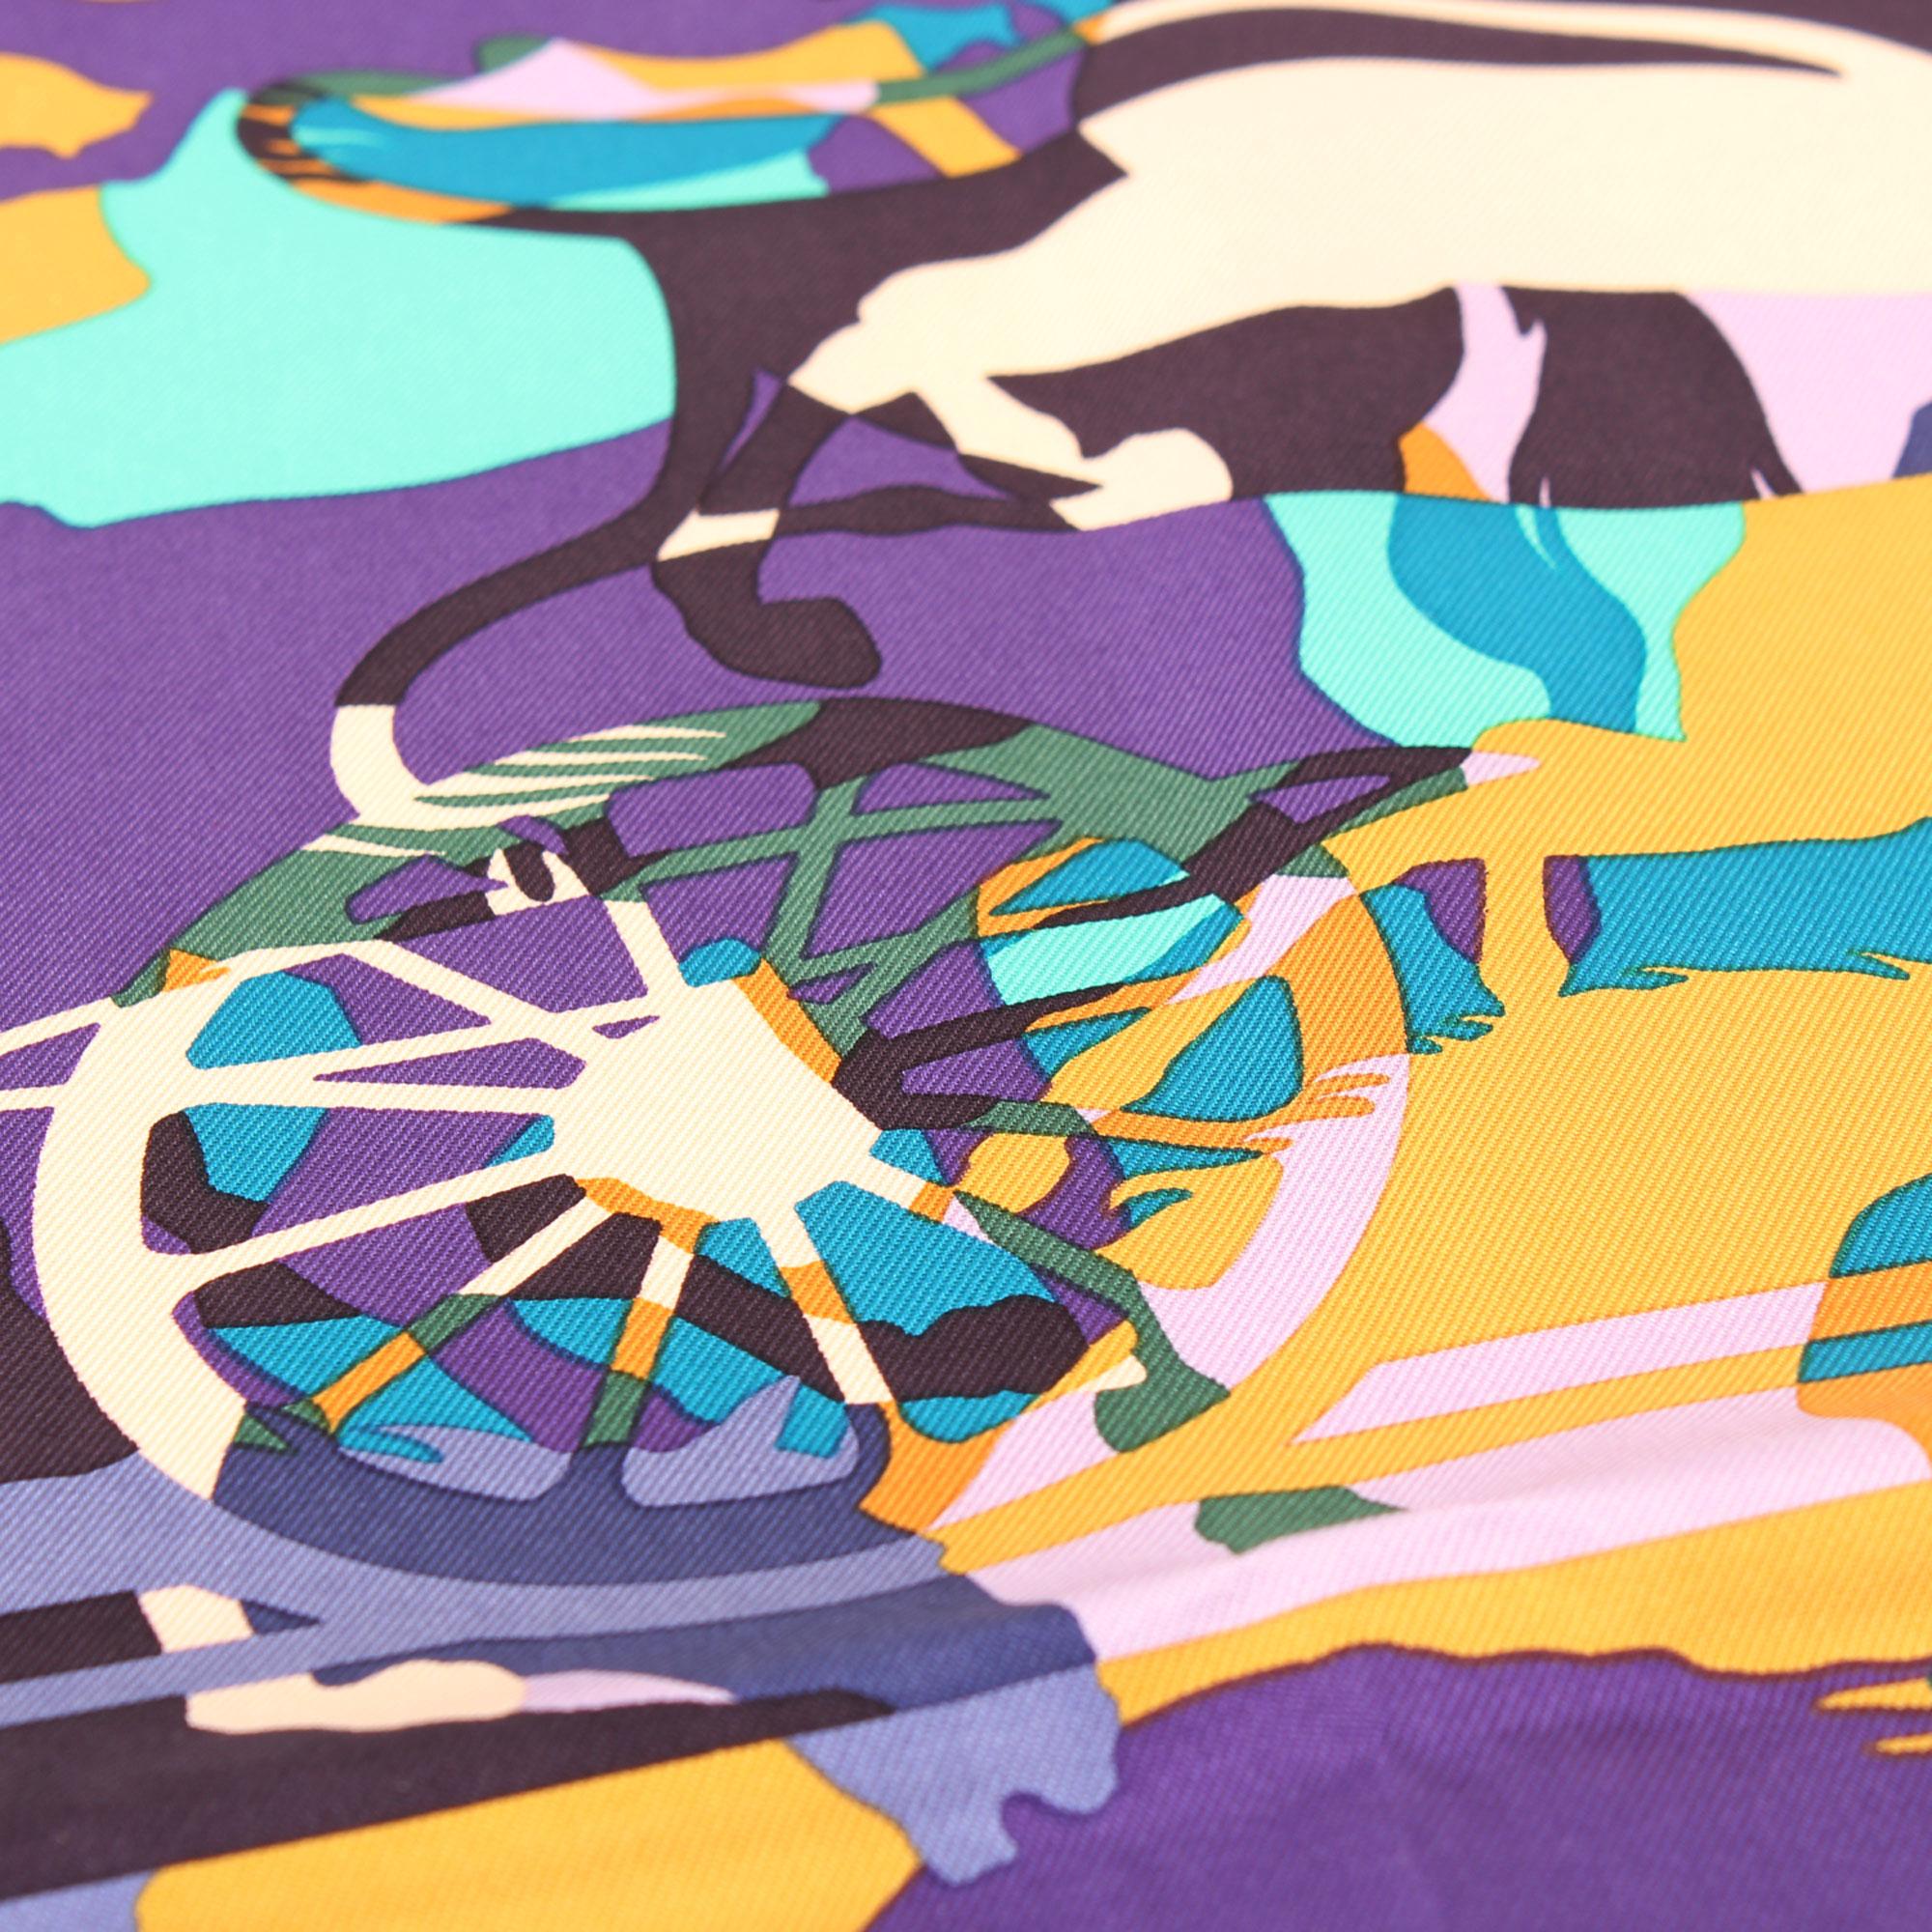 Imagen de detalle de la ilustracion del hermes carre ex libris en camouflage